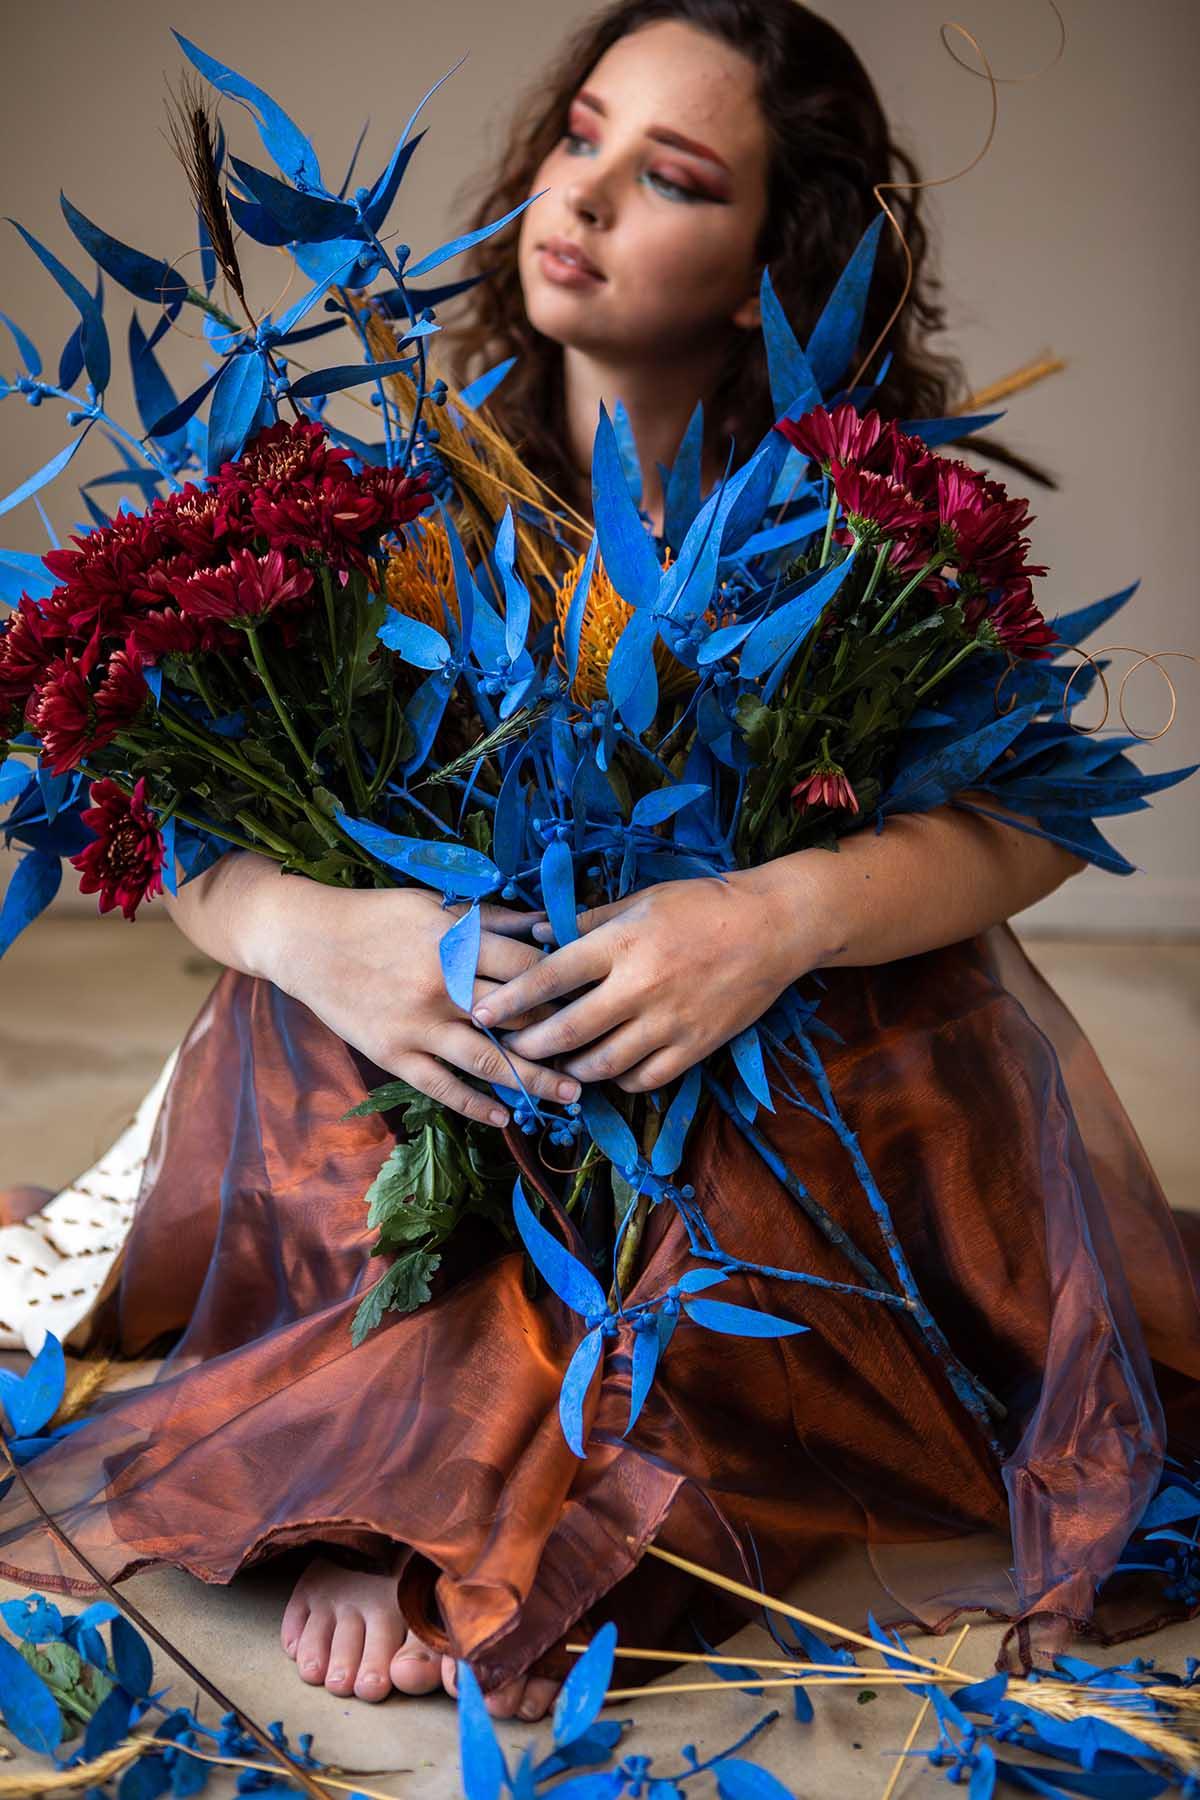 Darrell Fraser Award Winning Garden Route Portrait Photographer